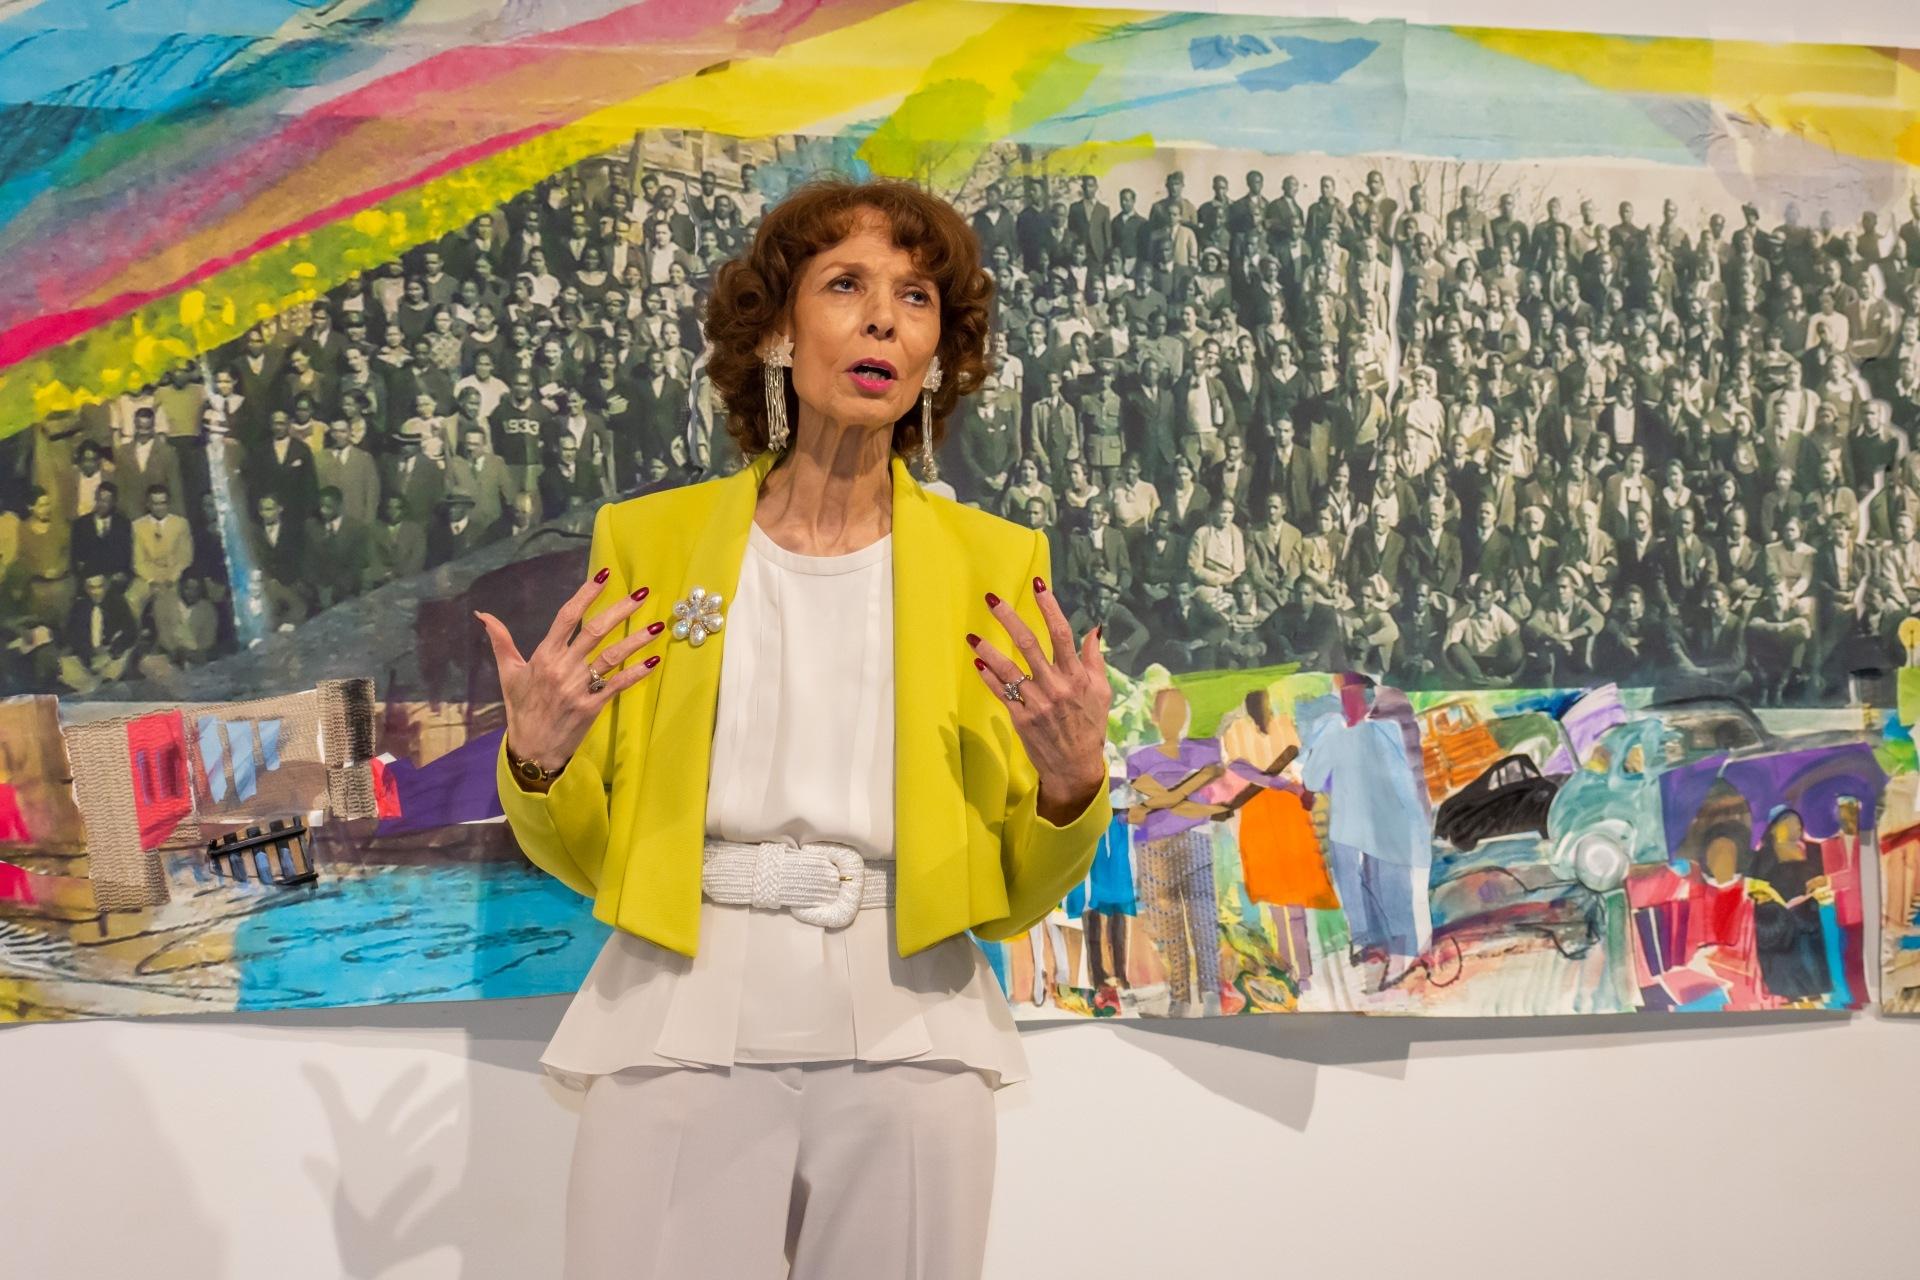 Artist Phoebe Beasley showcases her artwork